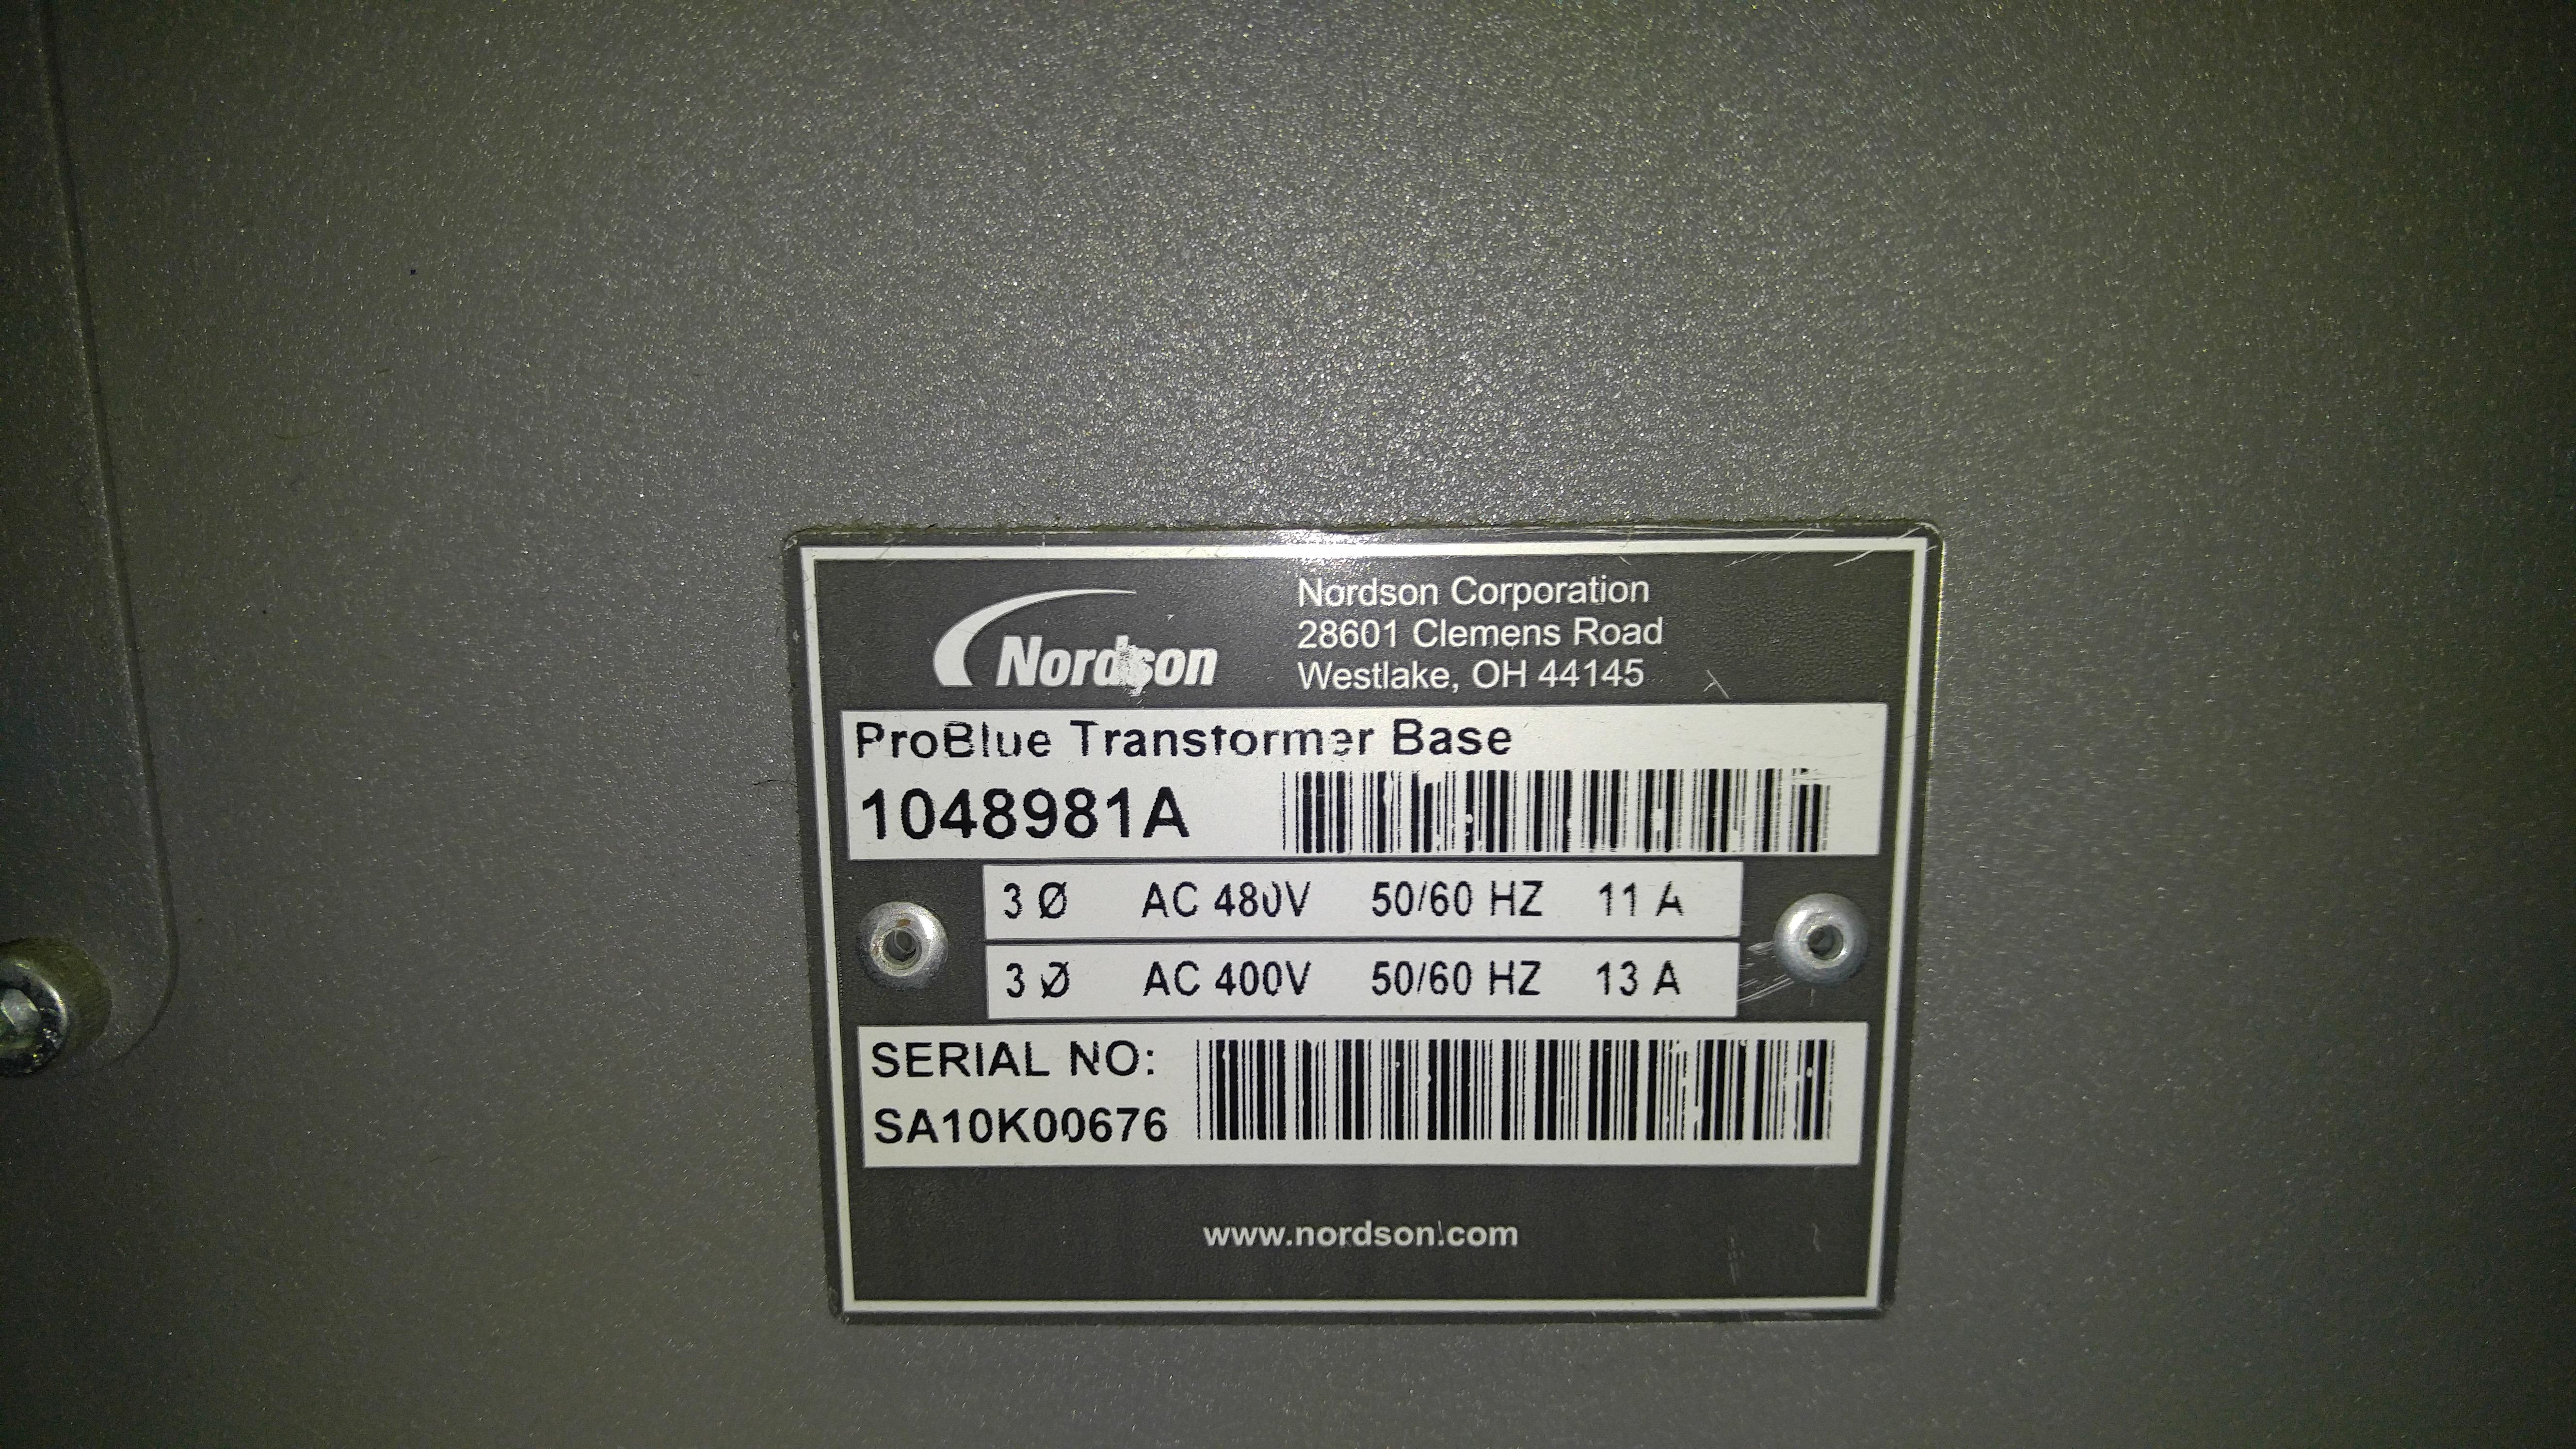 Lot 4A - Nordson Problue 15 Adhesive Melter Sn: SA10G02705 and Problue Transformer 1048981 Sn:SA10k60676,